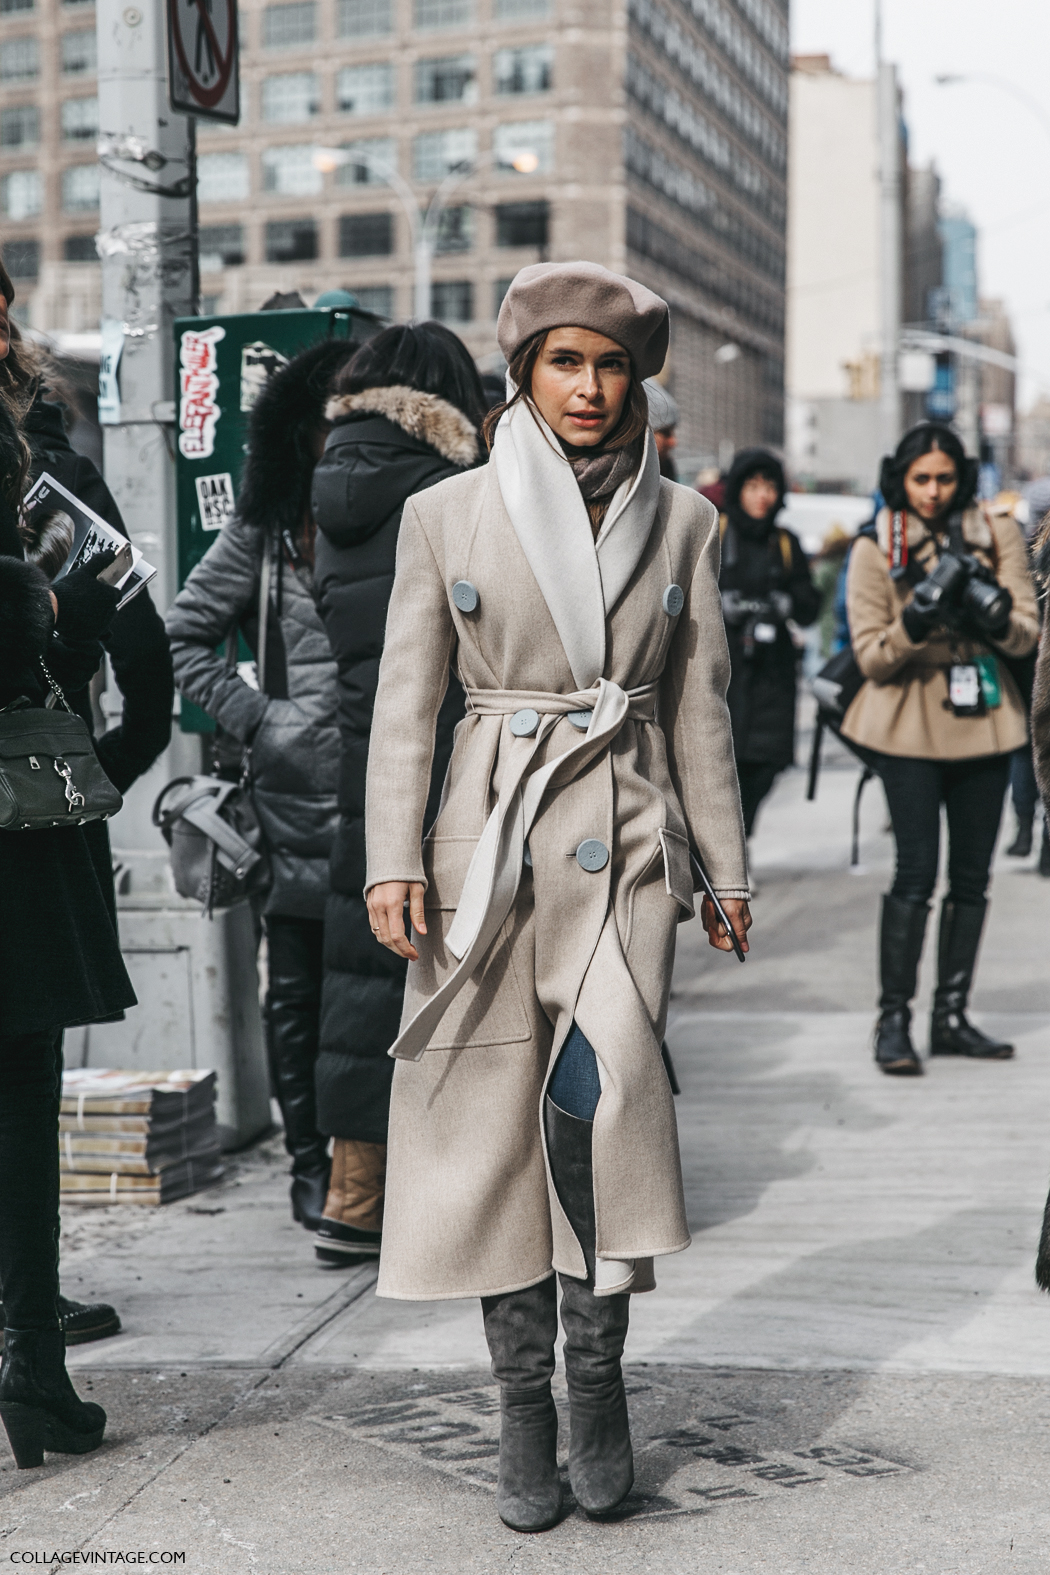 NYFW-New_York_Fashion_Week-Fall_Winter-17-Street_Style-Miroslava_Duma-2